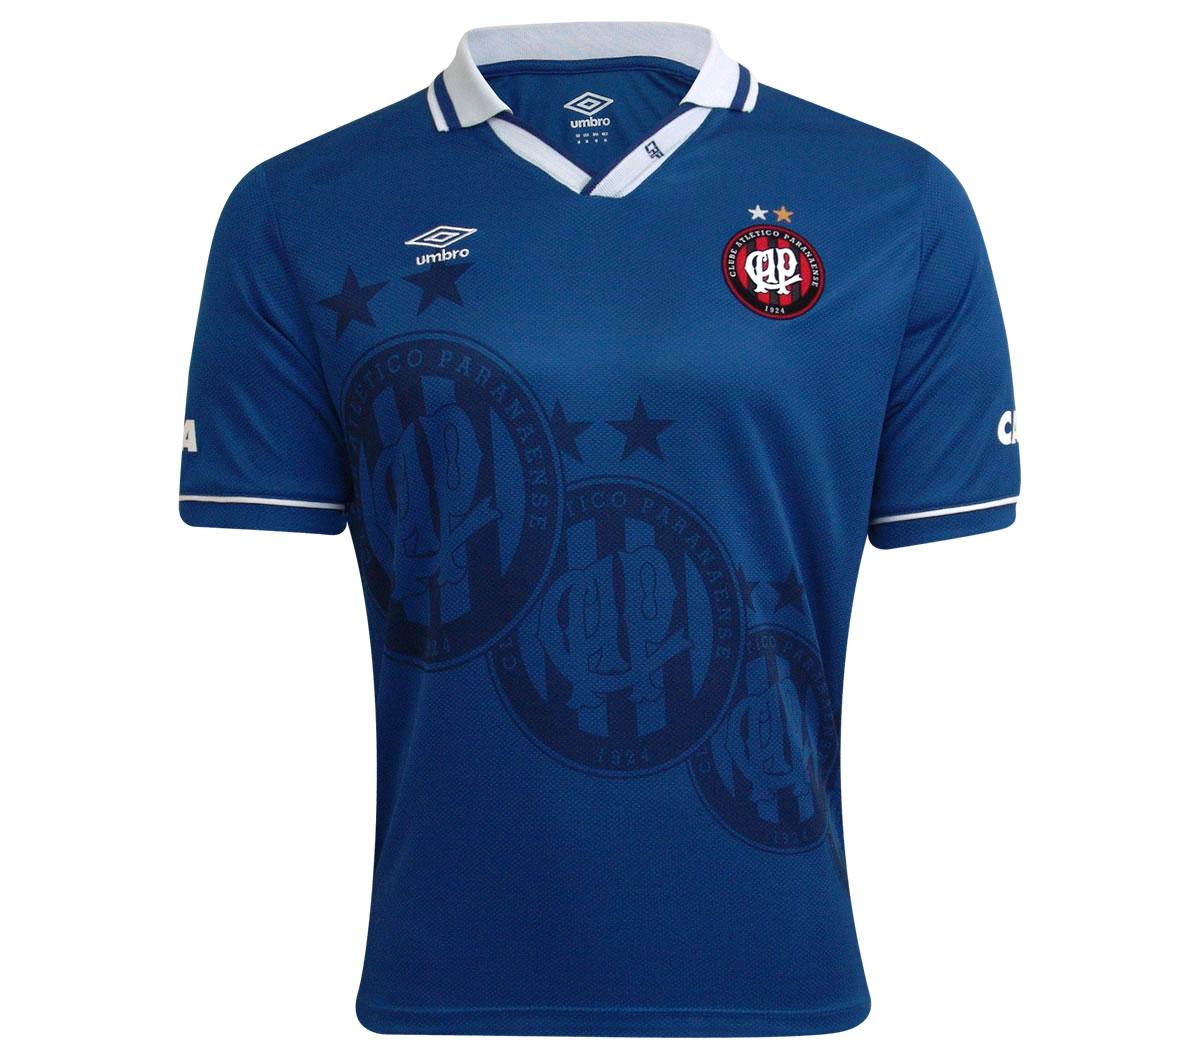 Camisa Atlético Paranaense III Umbro 2014 Nº 10